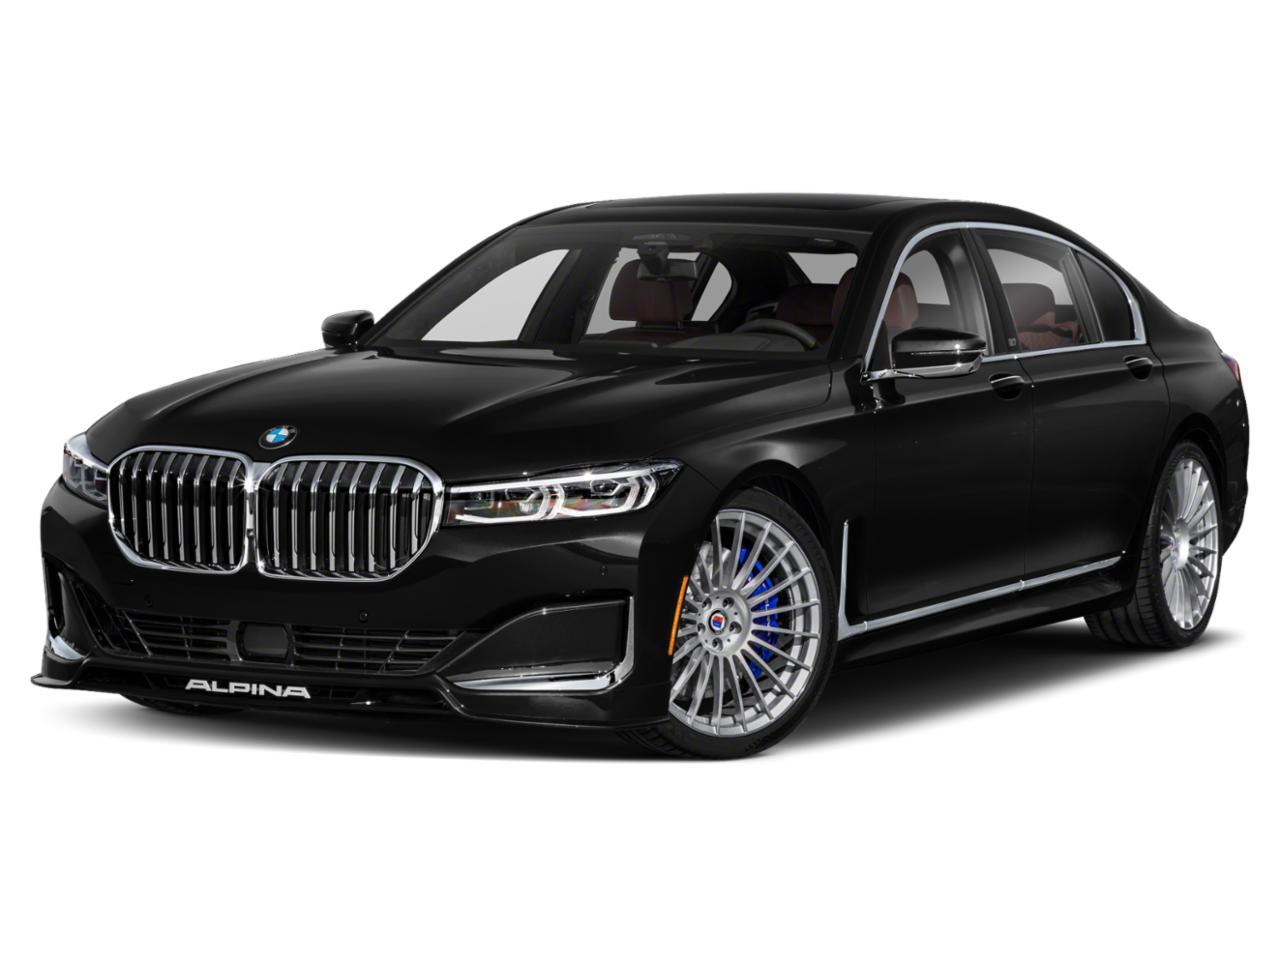 2022 BMW ALPINA B7 xDrive Vehicle Photo in Grapevine, TX 76051